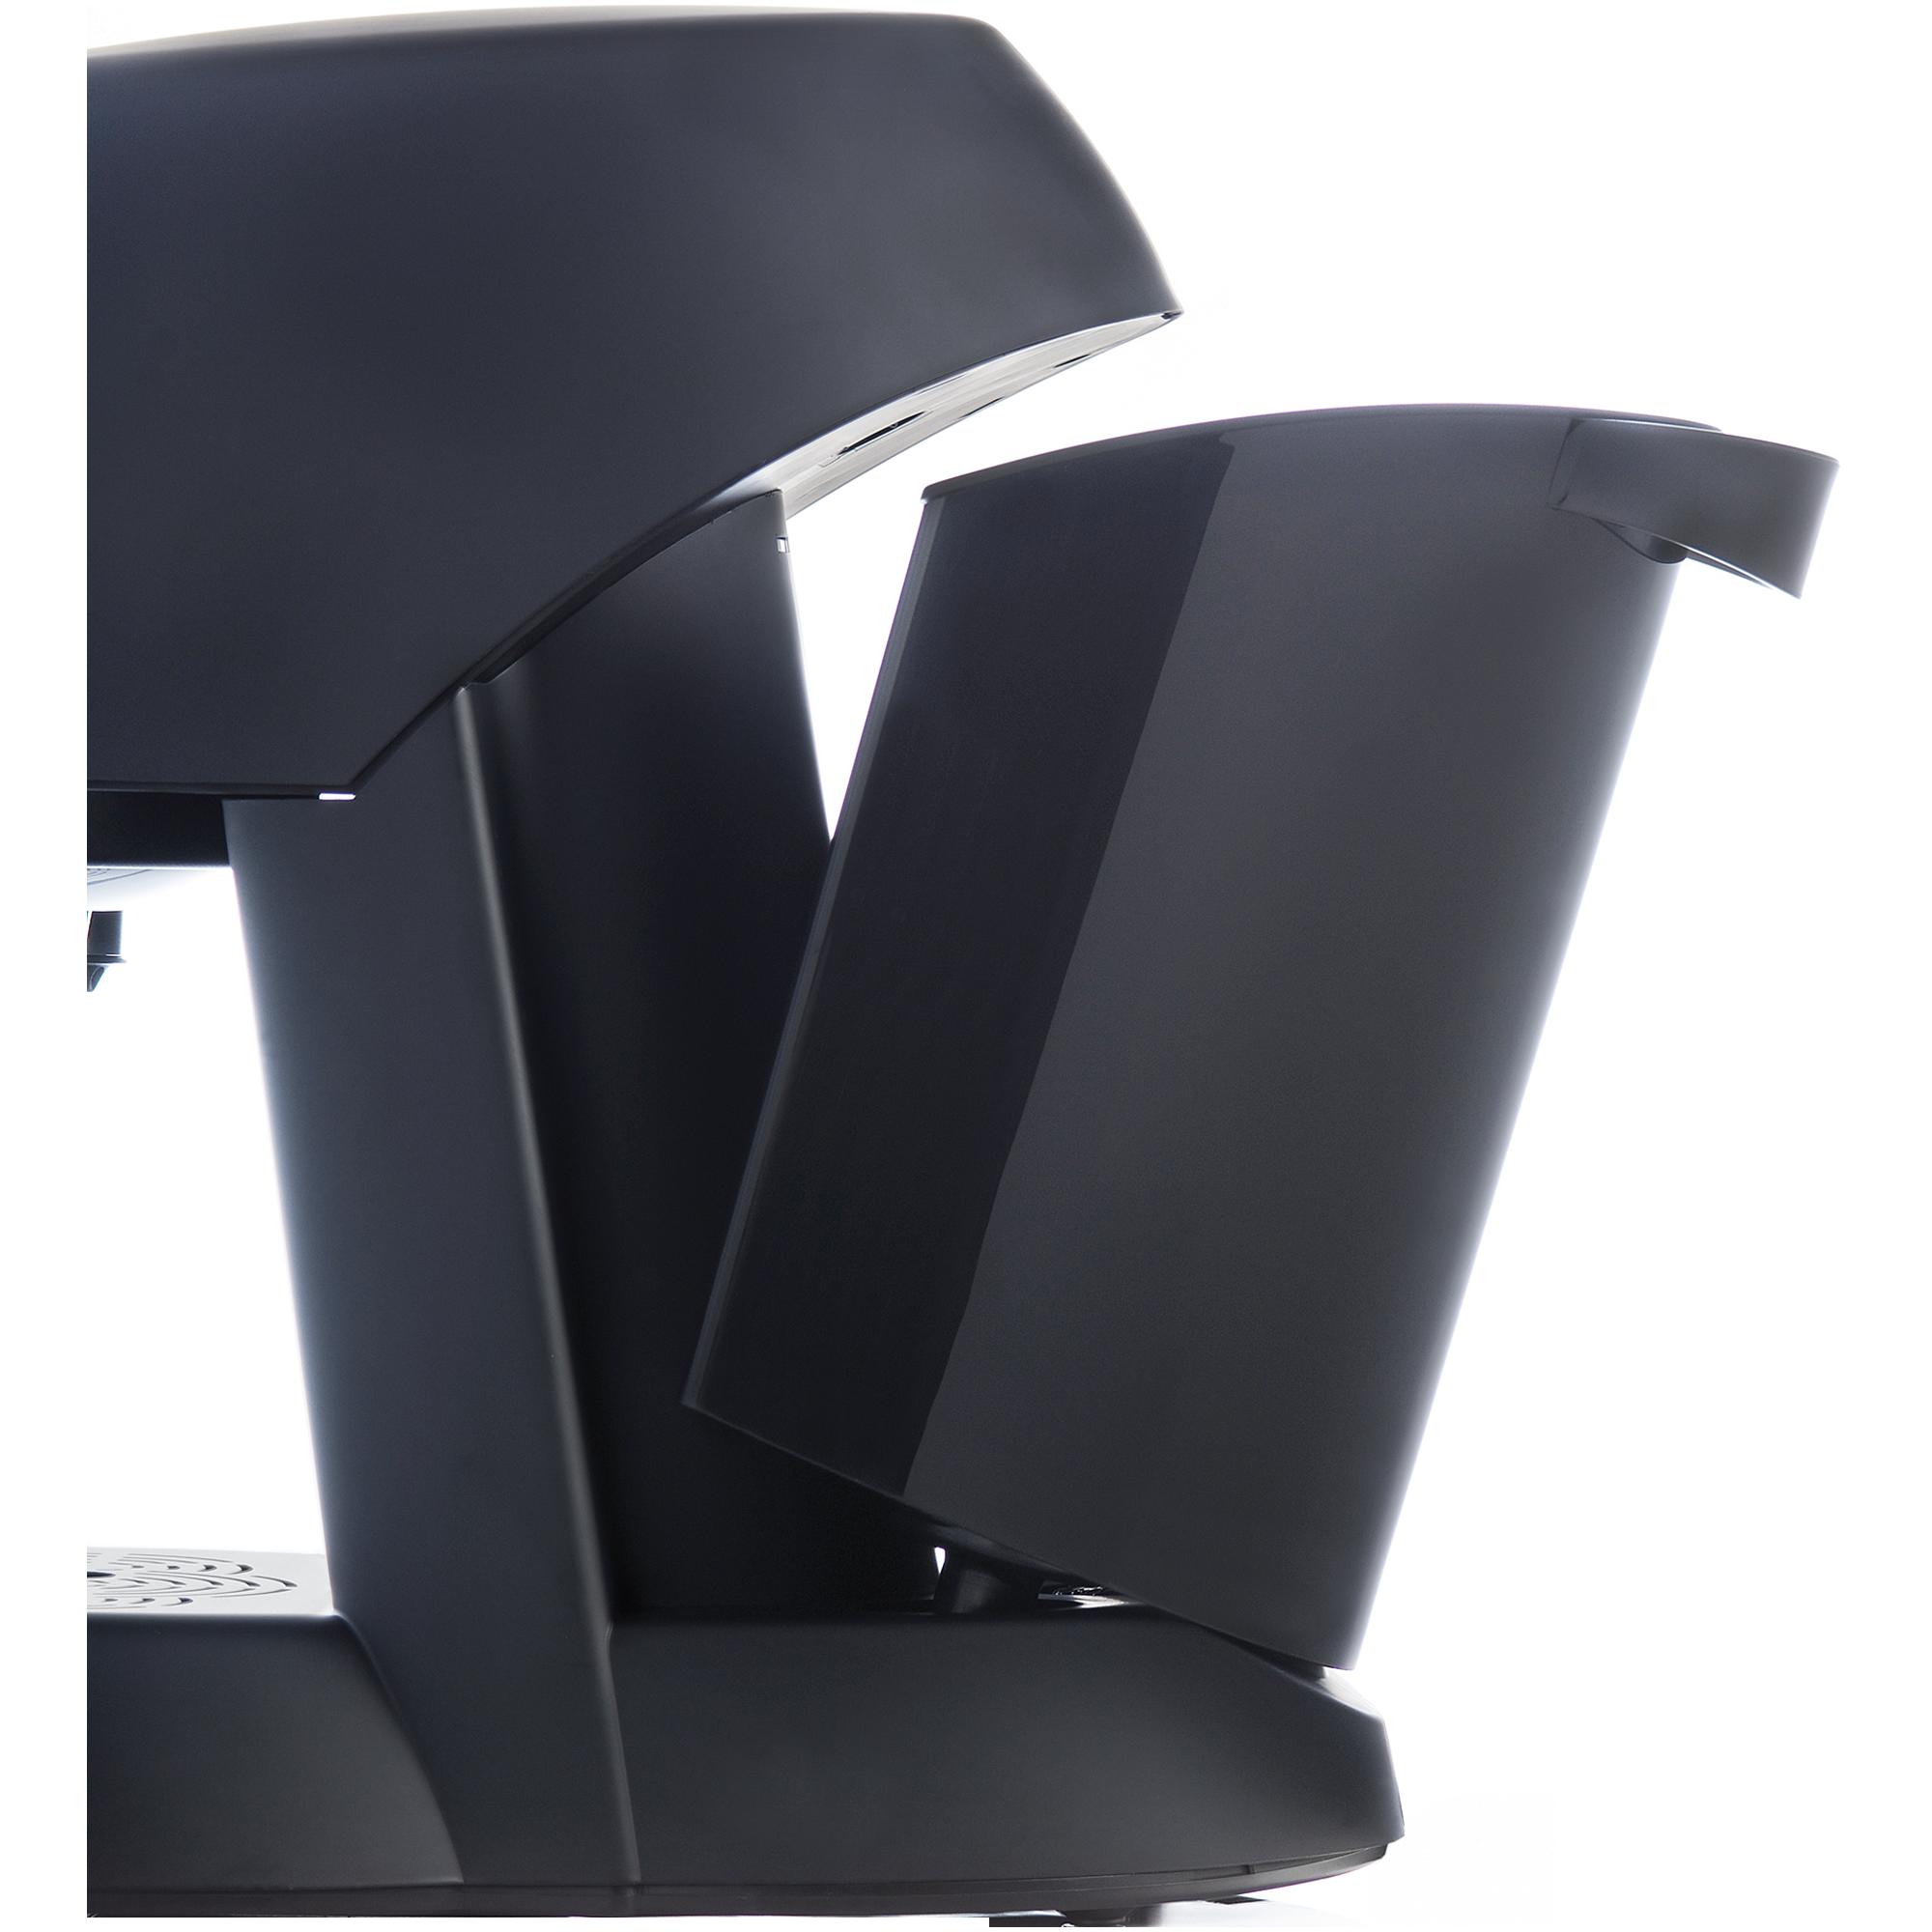 petra electric km kaffeepadmaschine artenso latte ebay. Black Bedroom Furniture Sets. Home Design Ideas